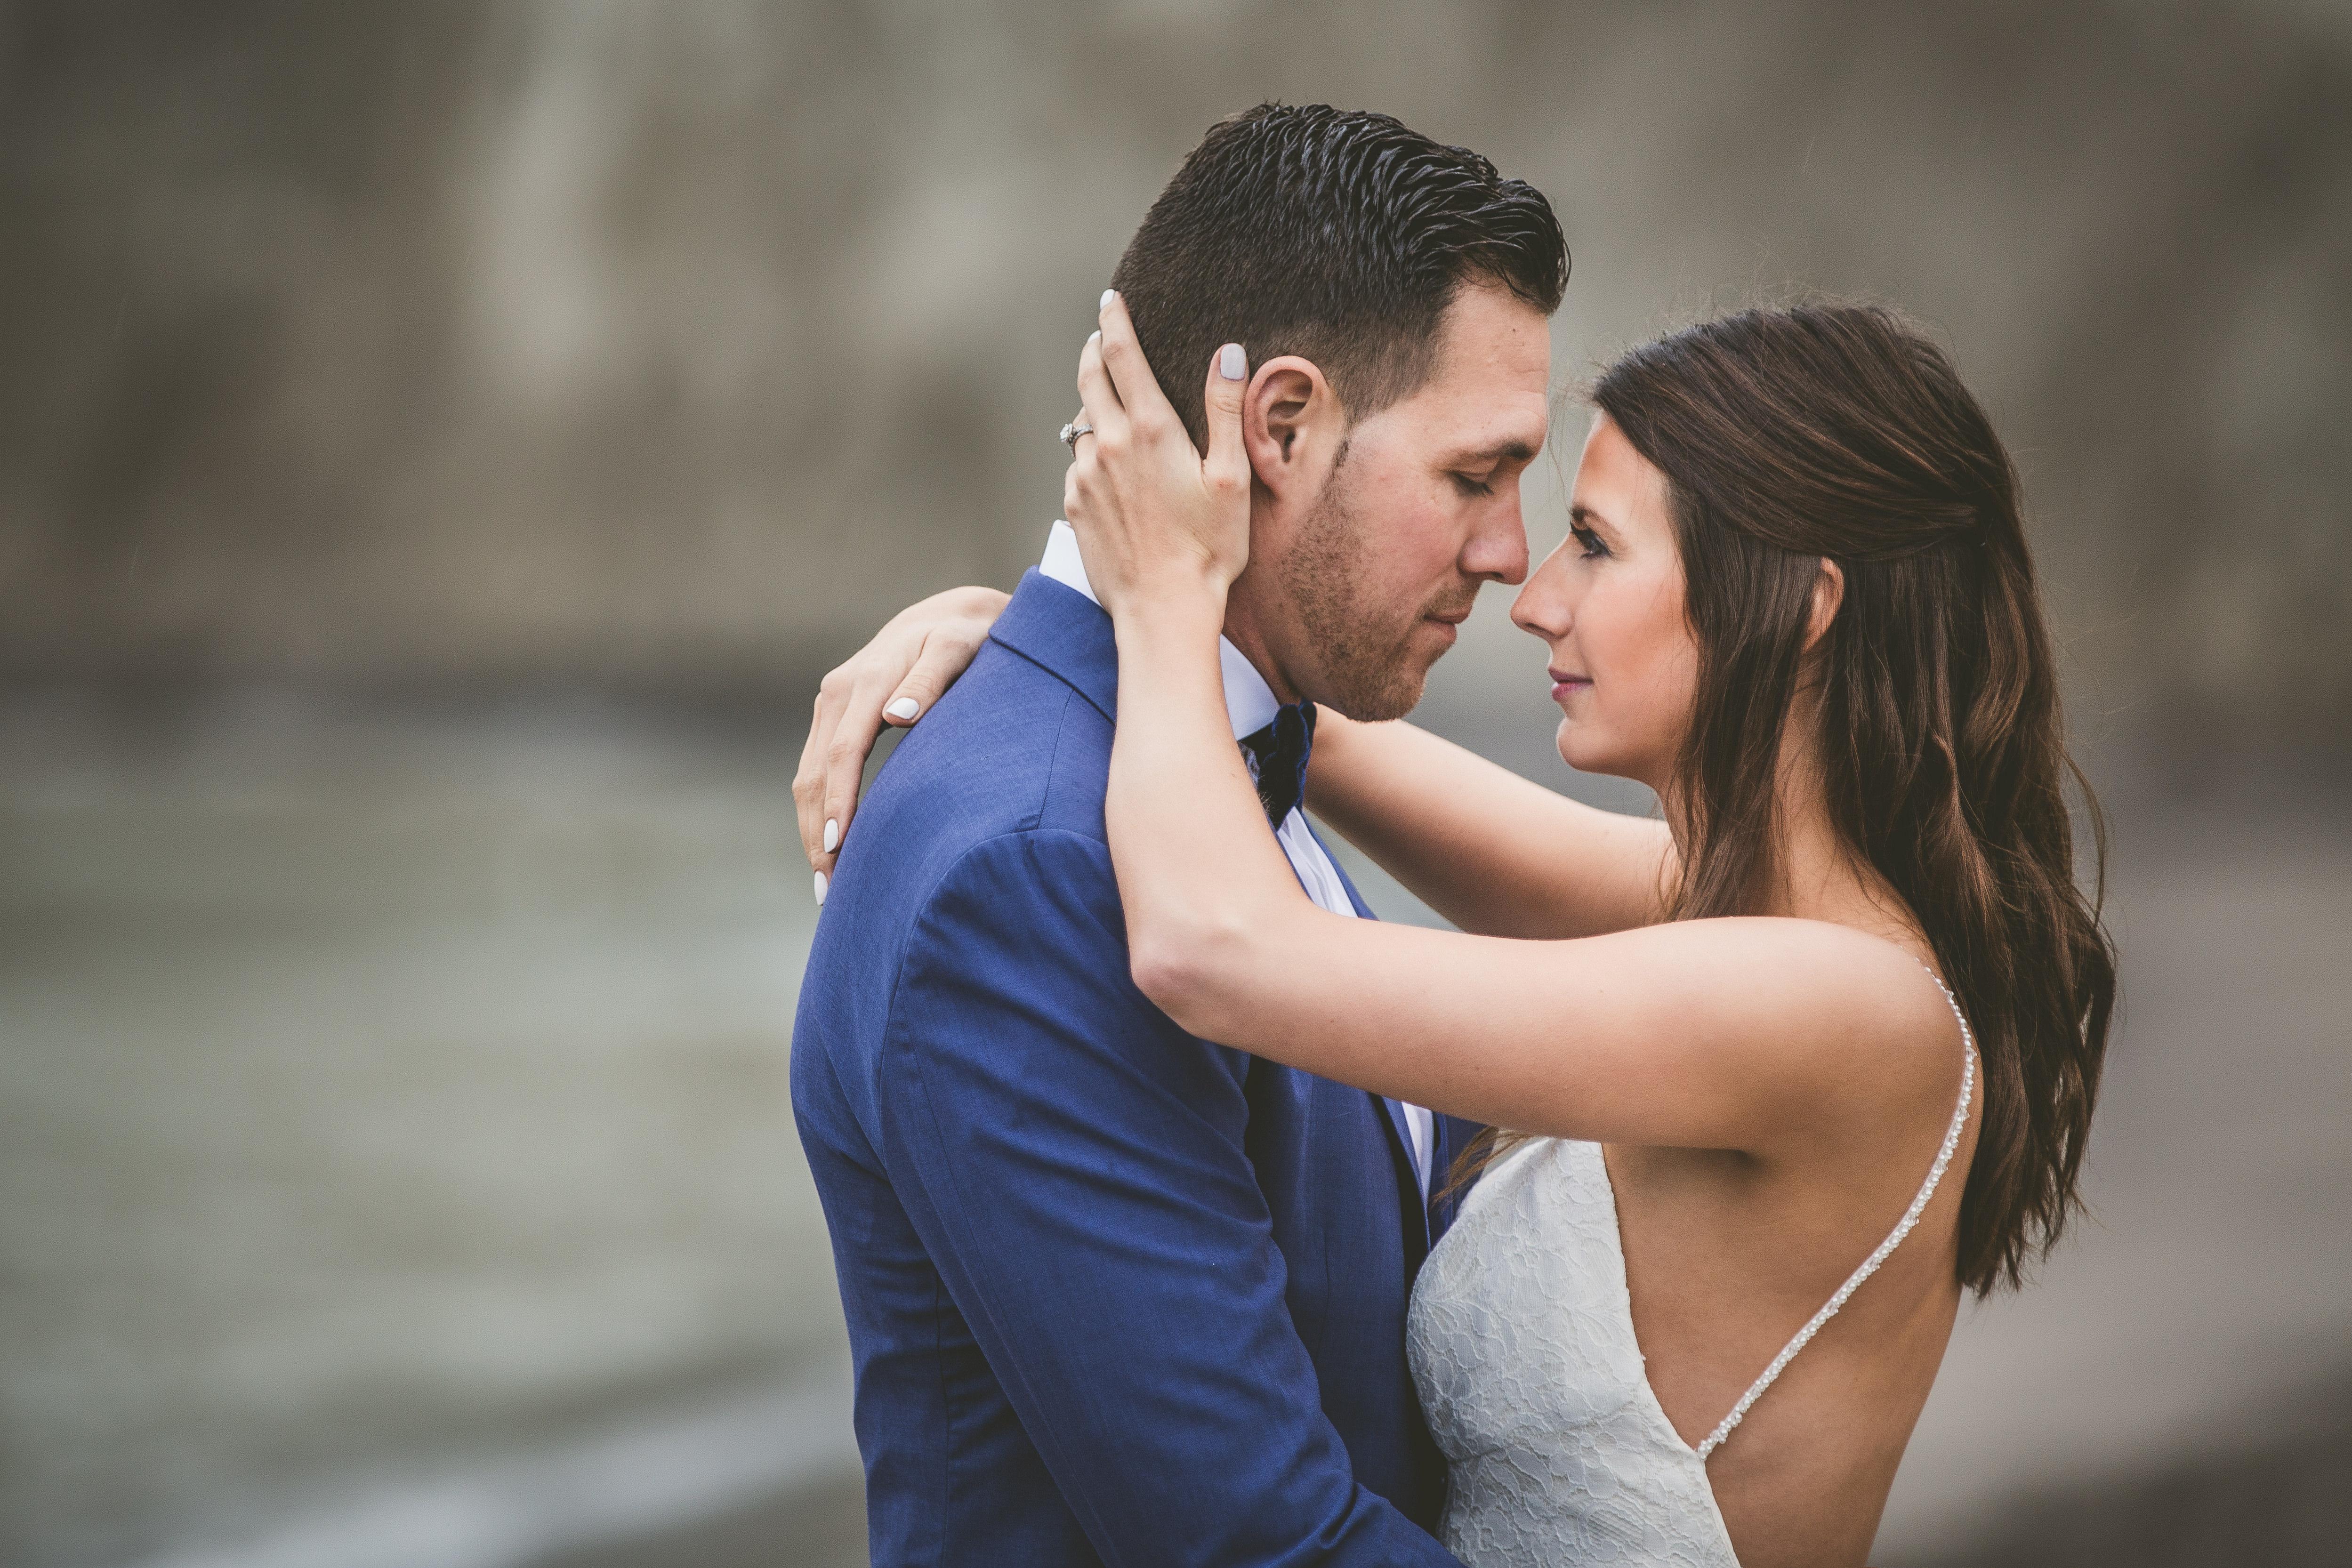 scarborough bluffs wedding photos 40 - Scarborough Bluffs Wedding Photos